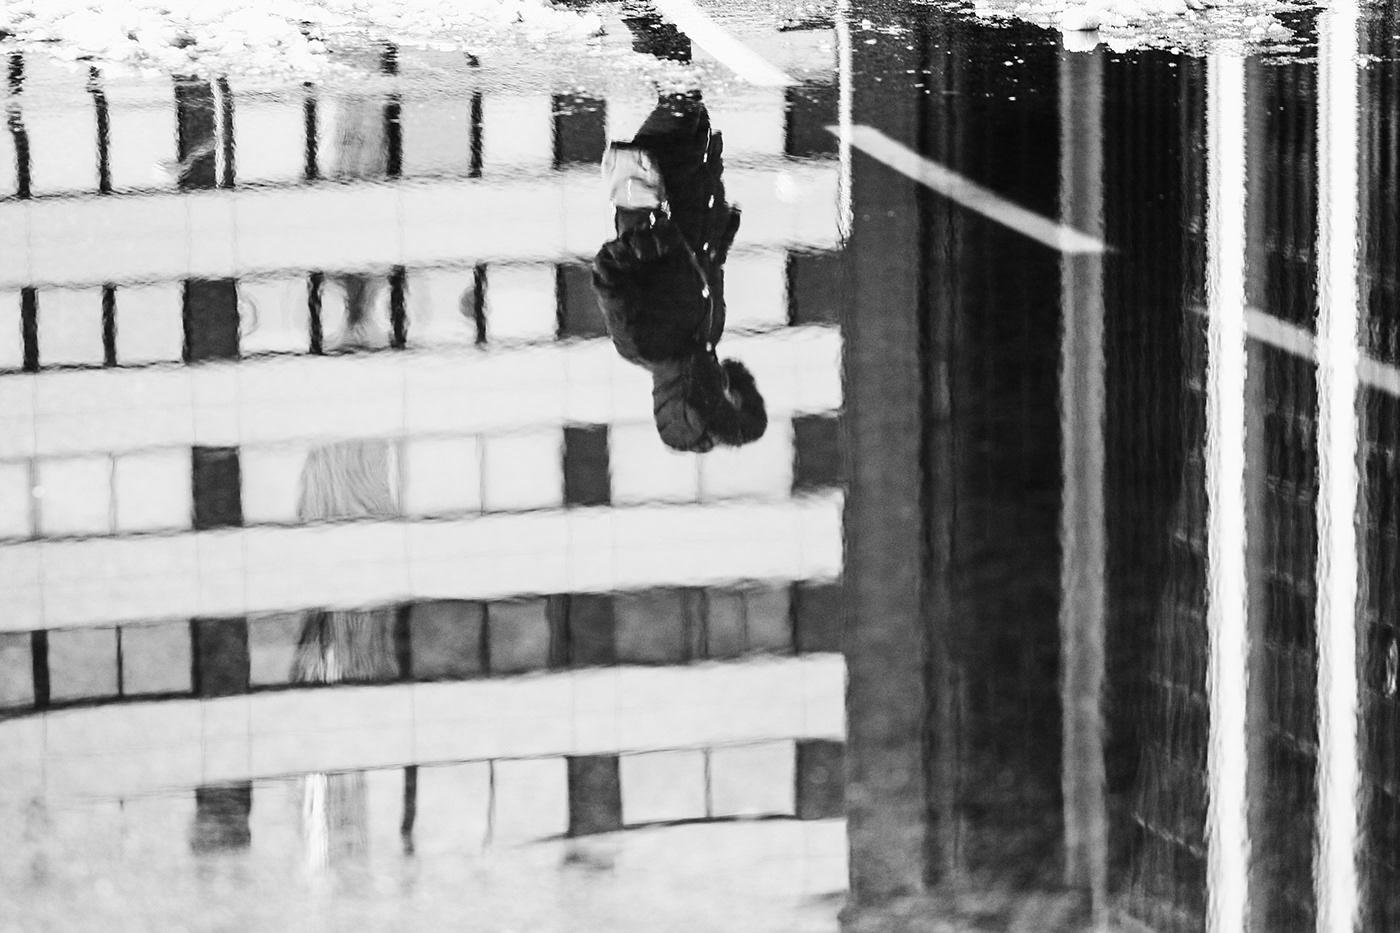 art bnw contemporaryphotography Documentary  lens photodocumentary Photography  Photojournalist streetphotographer